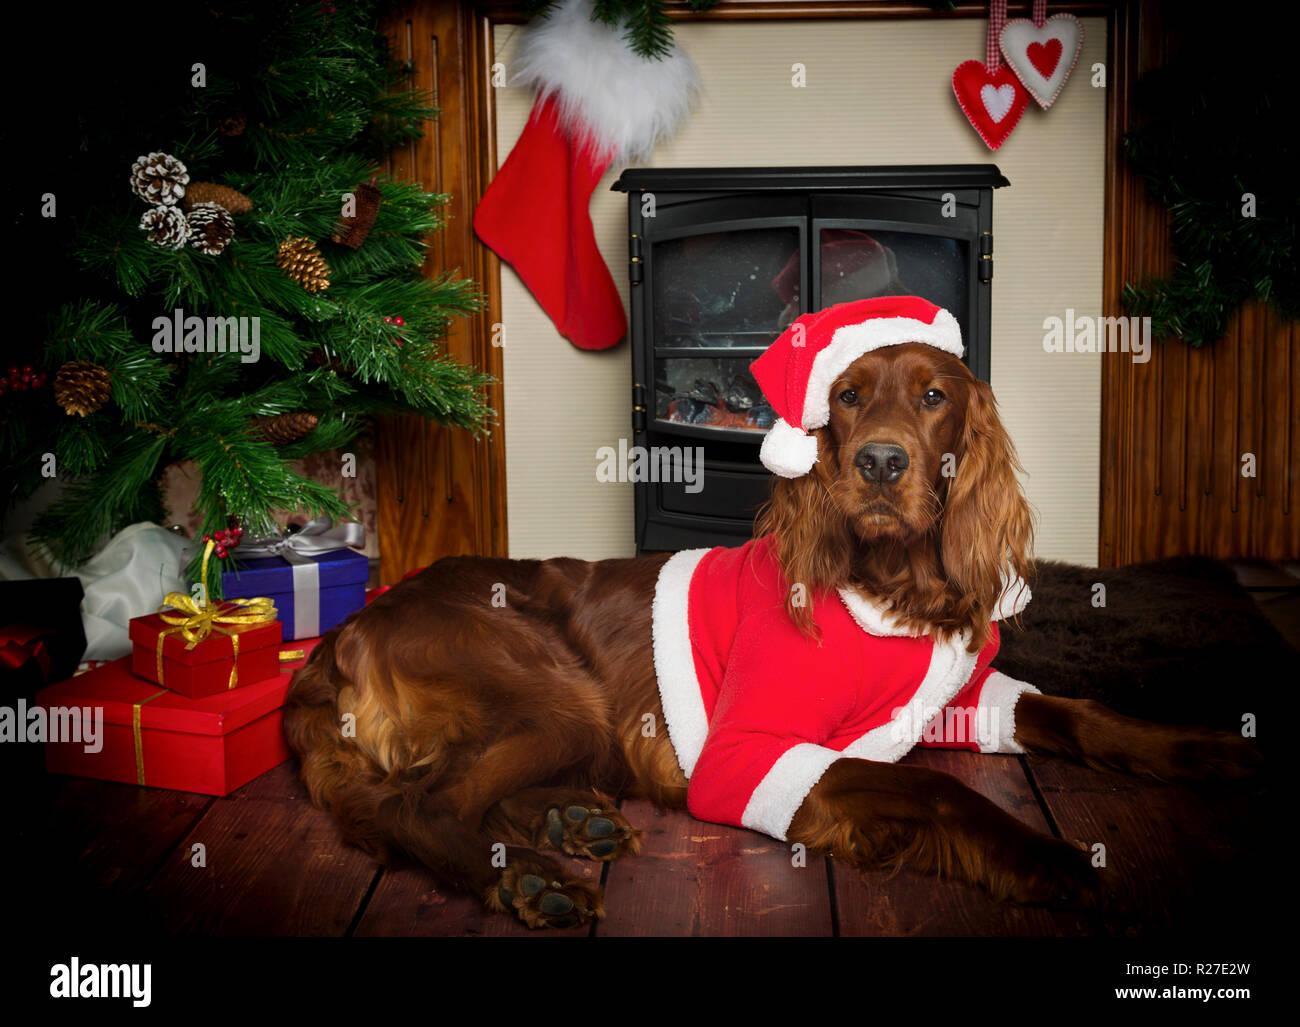 Red Irish Setter Dog in Calendar Themed Studio Pose Stock Photo